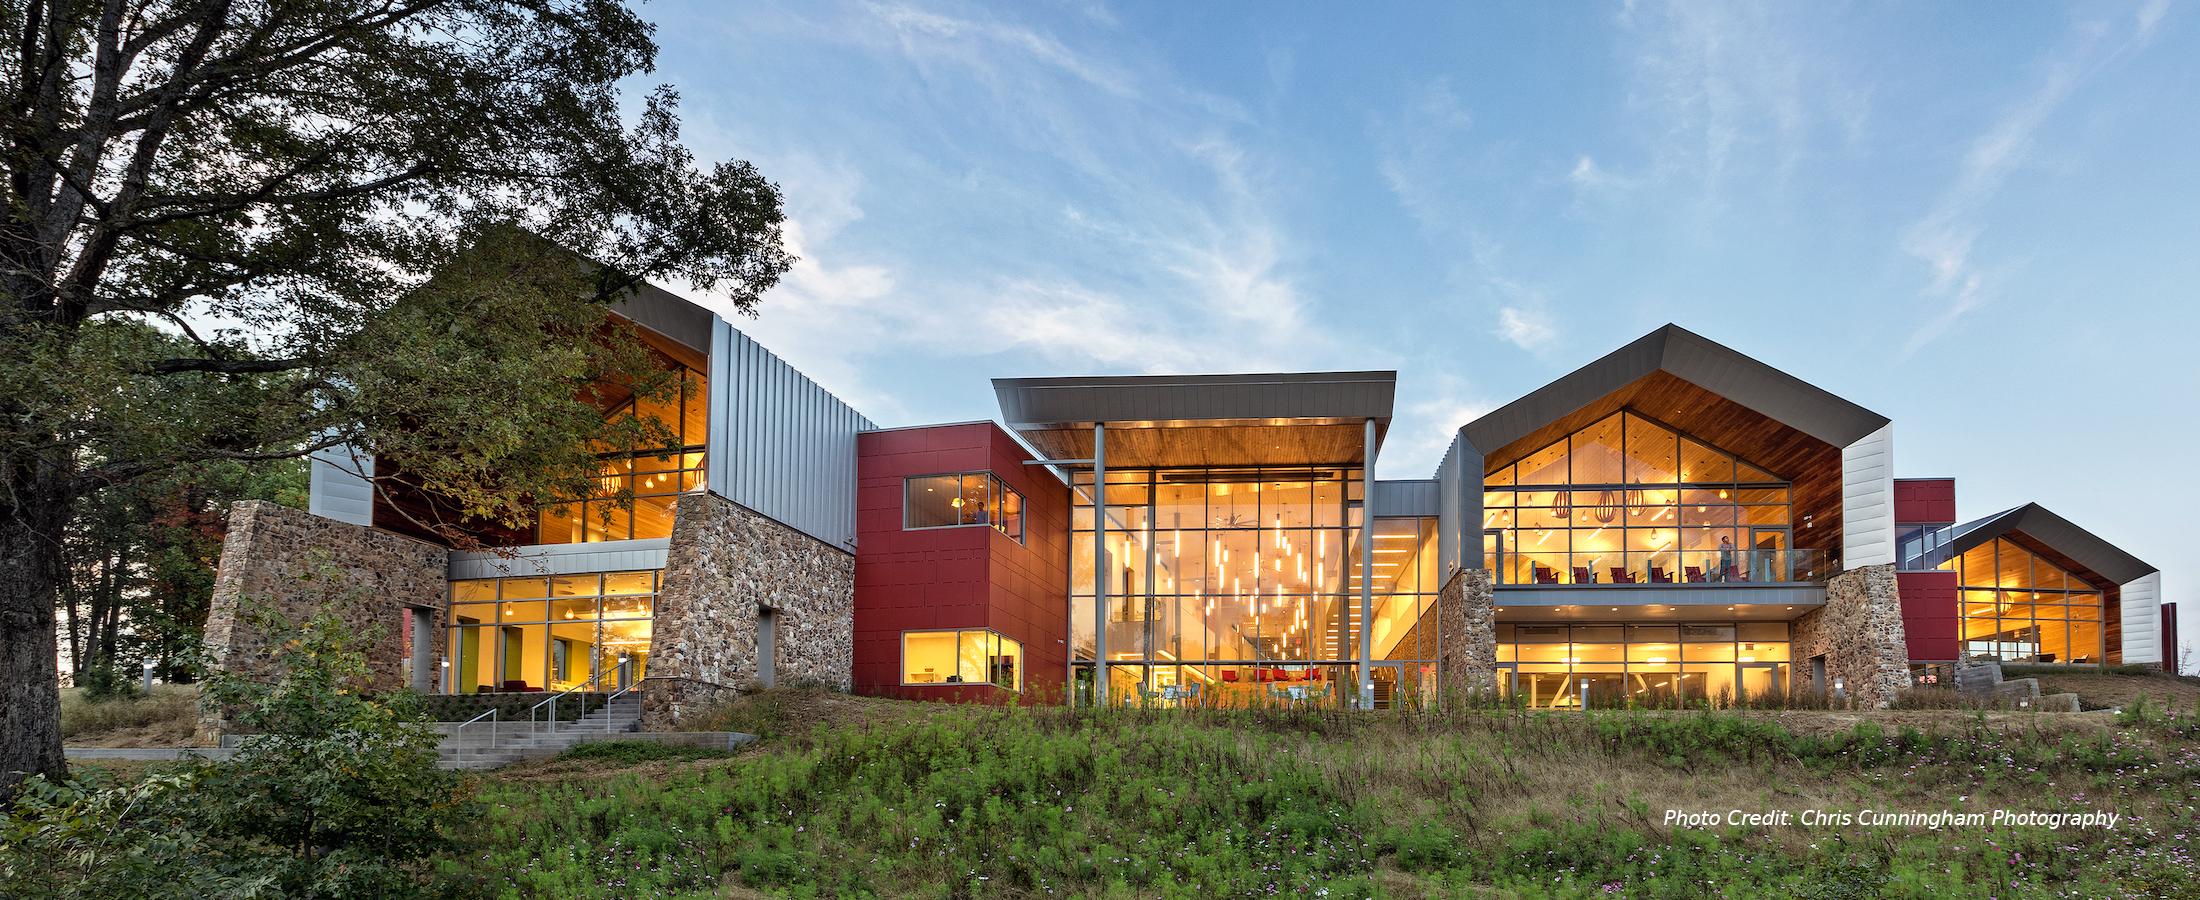 Varina Area Library - Richmond, VA - Elevation -  Photo Credit: Chris Cunningham Photography